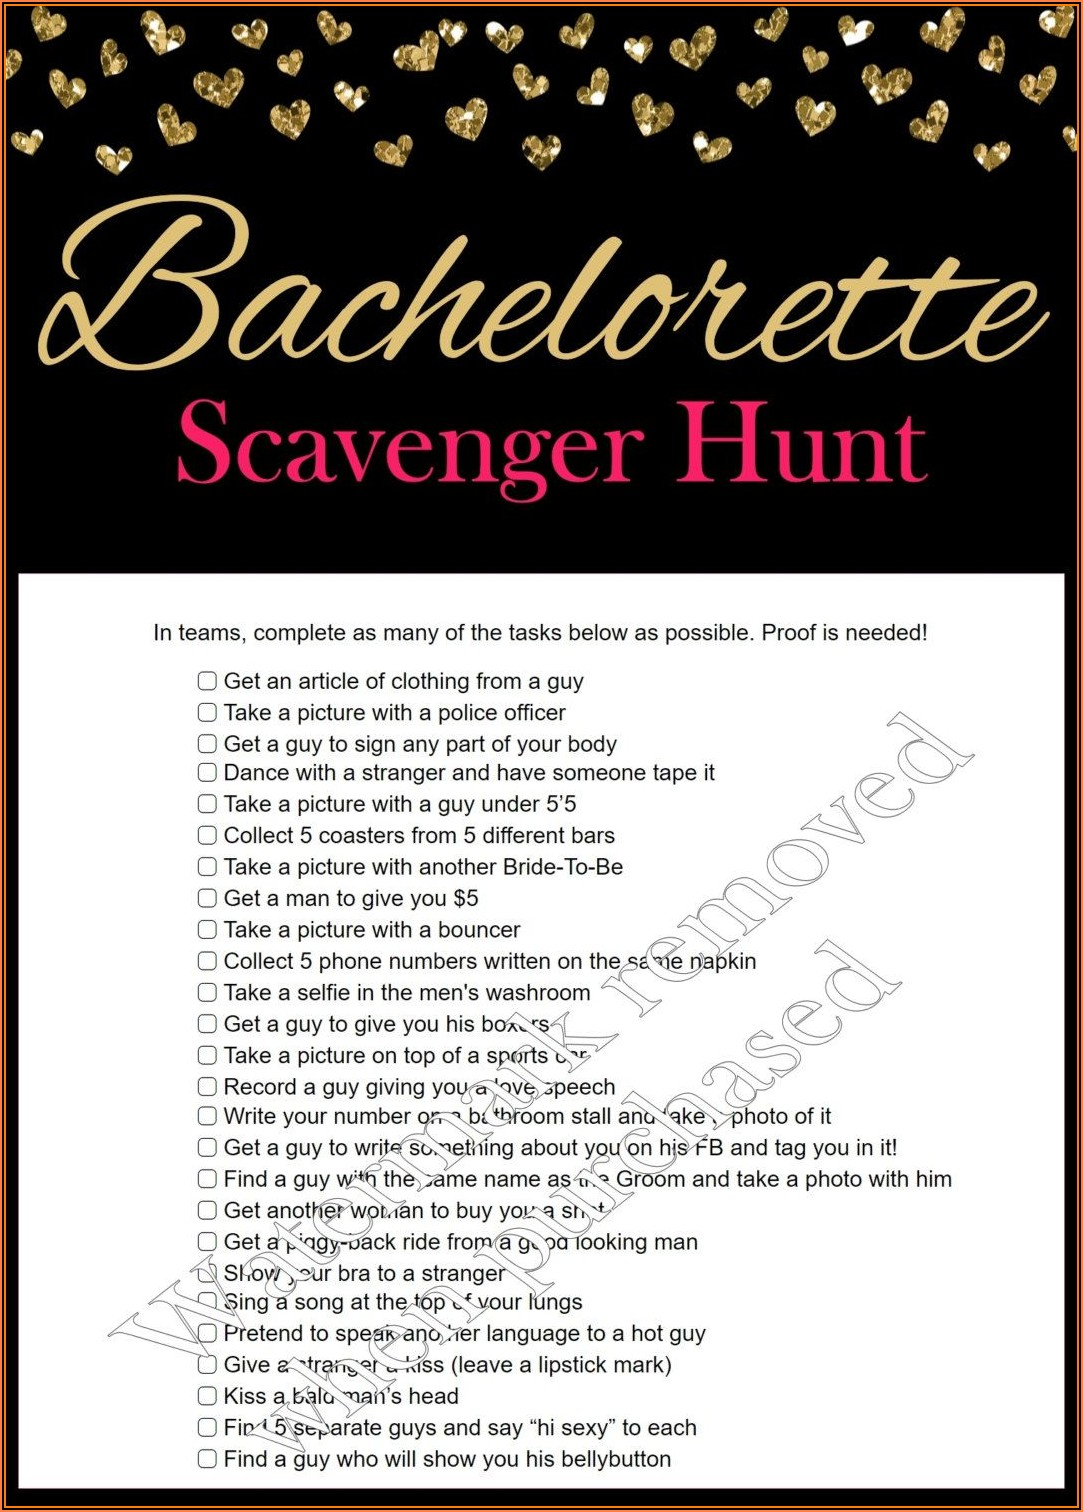 Free Bachelorette Party Scavenger Hunt Template